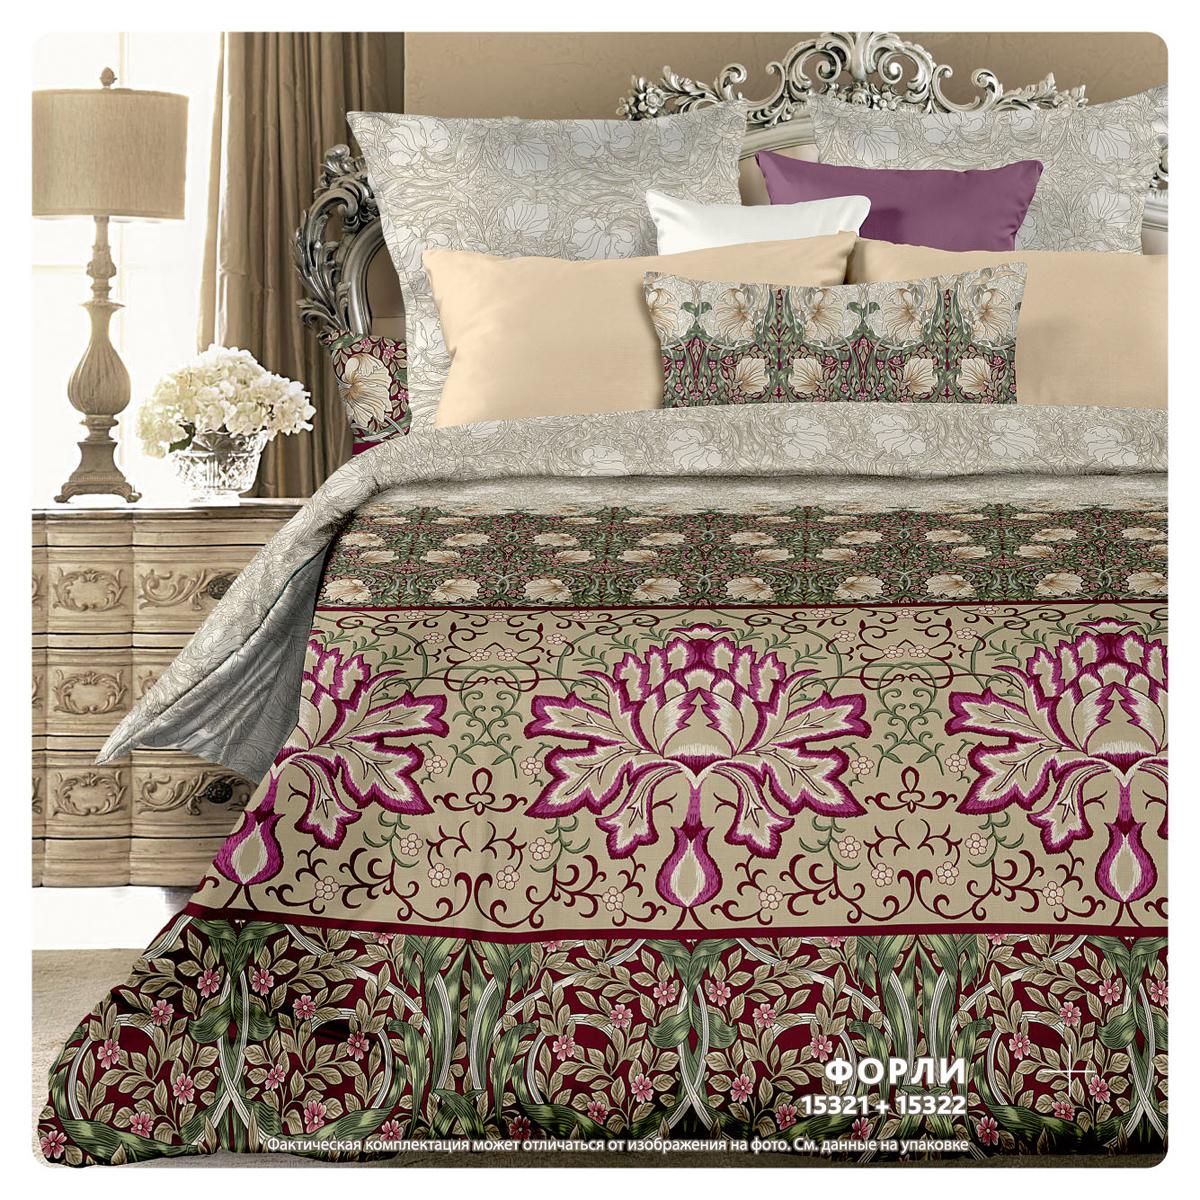 Комплект постельного белья Унисон Форли, евро, наволочки 70x70